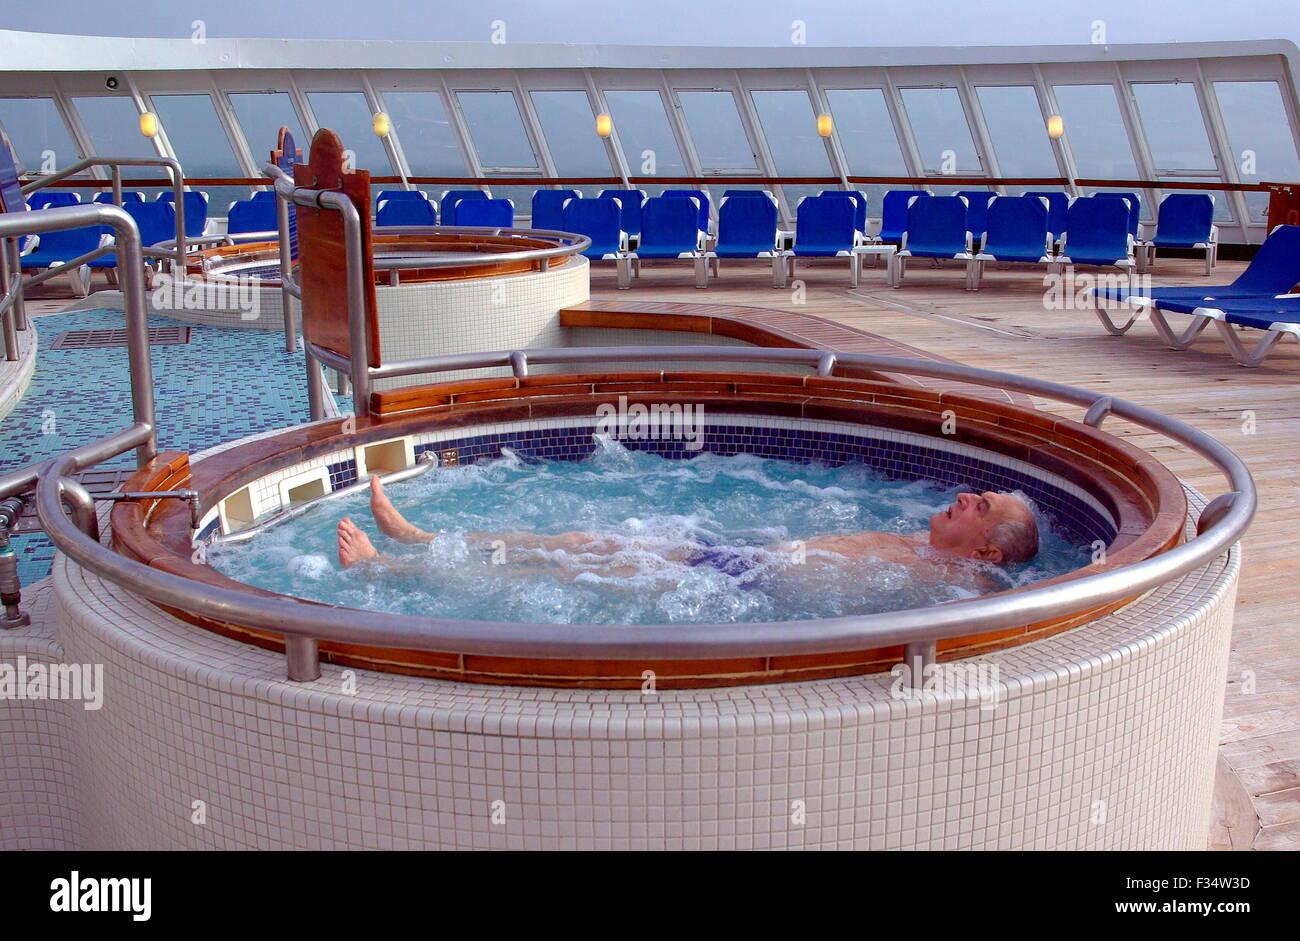 AJAXNETPHOTO. 2006. AT SEA. - CRUISE LINER - PASSENGER ON THE LINER QE2 ENJOYS A JACUZZI DIP. PHOTO:JONATHAN EASTLAND/AJAX - Stock Image